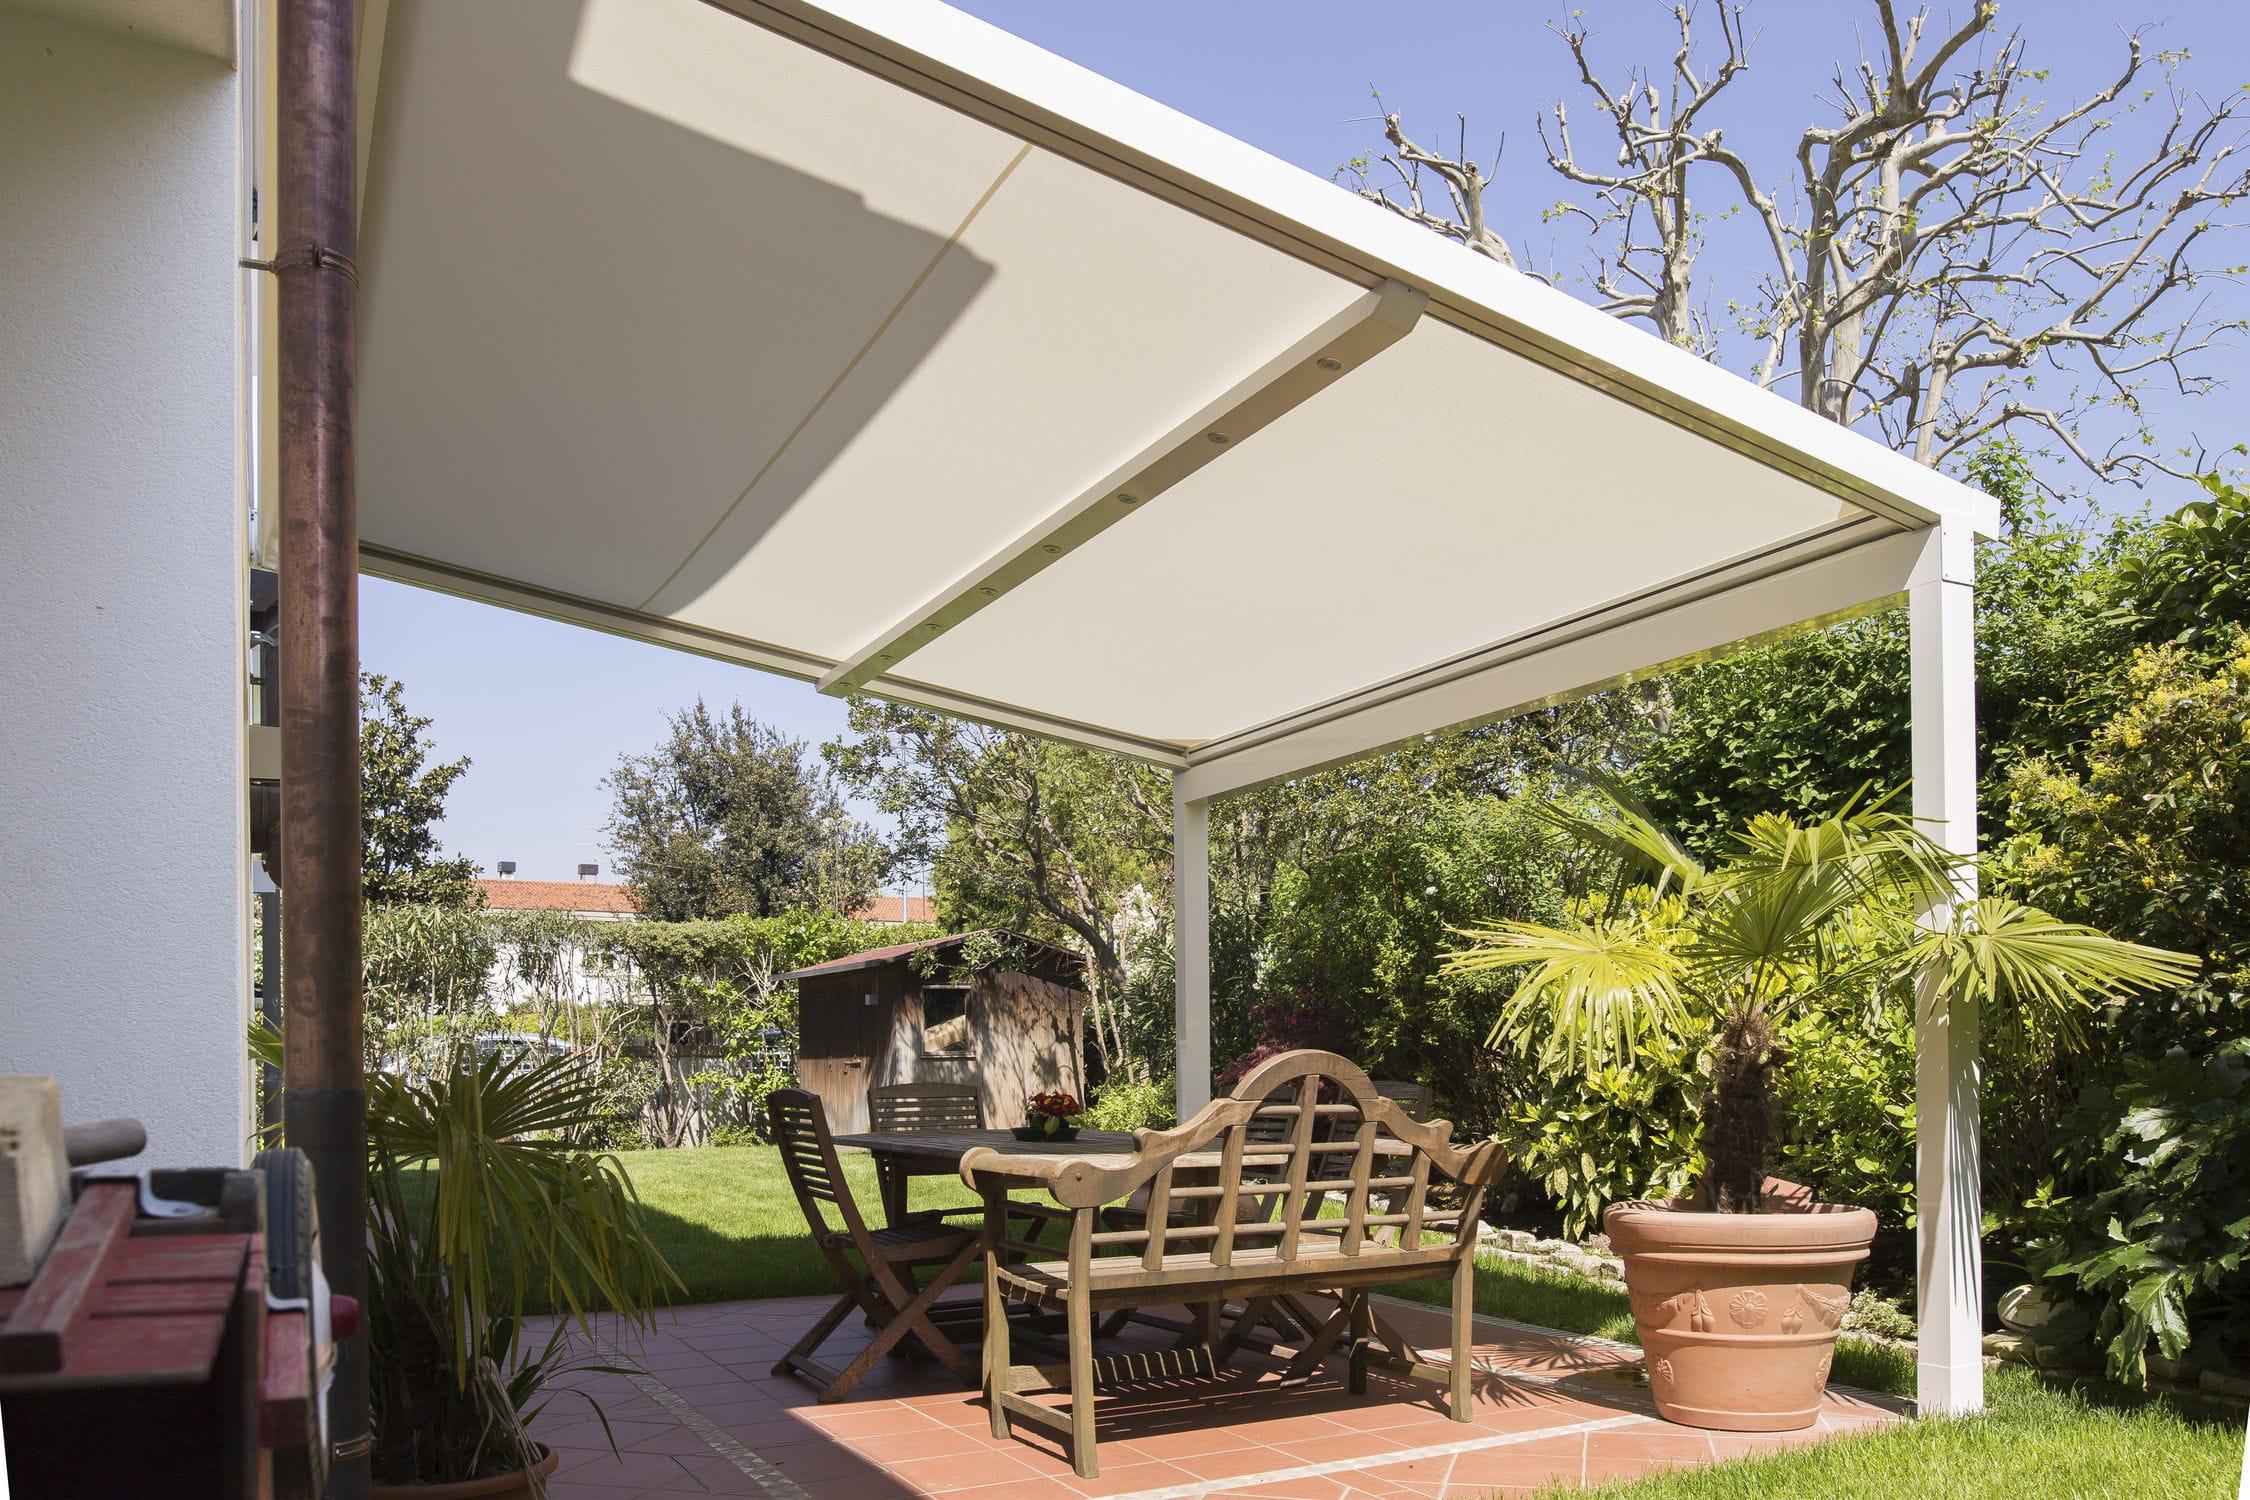 ... Wall-mounted pergola / aluminum / commercial XTESA KE Outdoor Design ... & Wall-mounted pergola / aluminum / commercial - XTESA - KE Outdoor ...